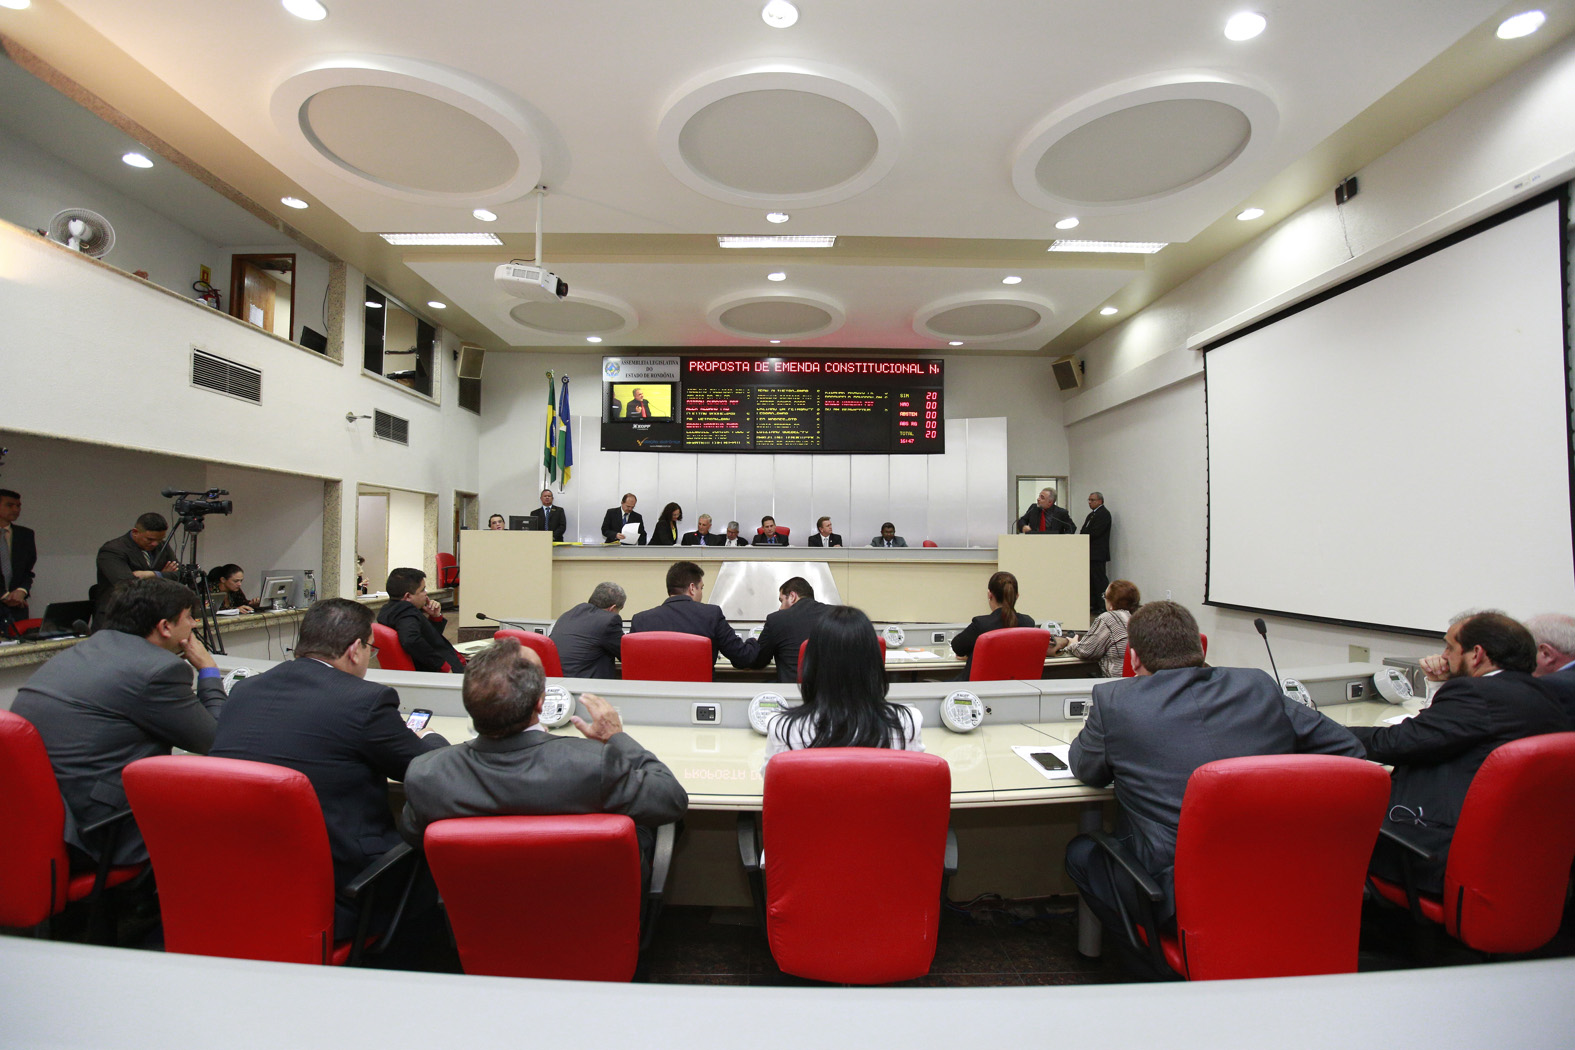 assembleia-aprova-pec-que-beneficia-policiais-militares-de-rondonia.jpg